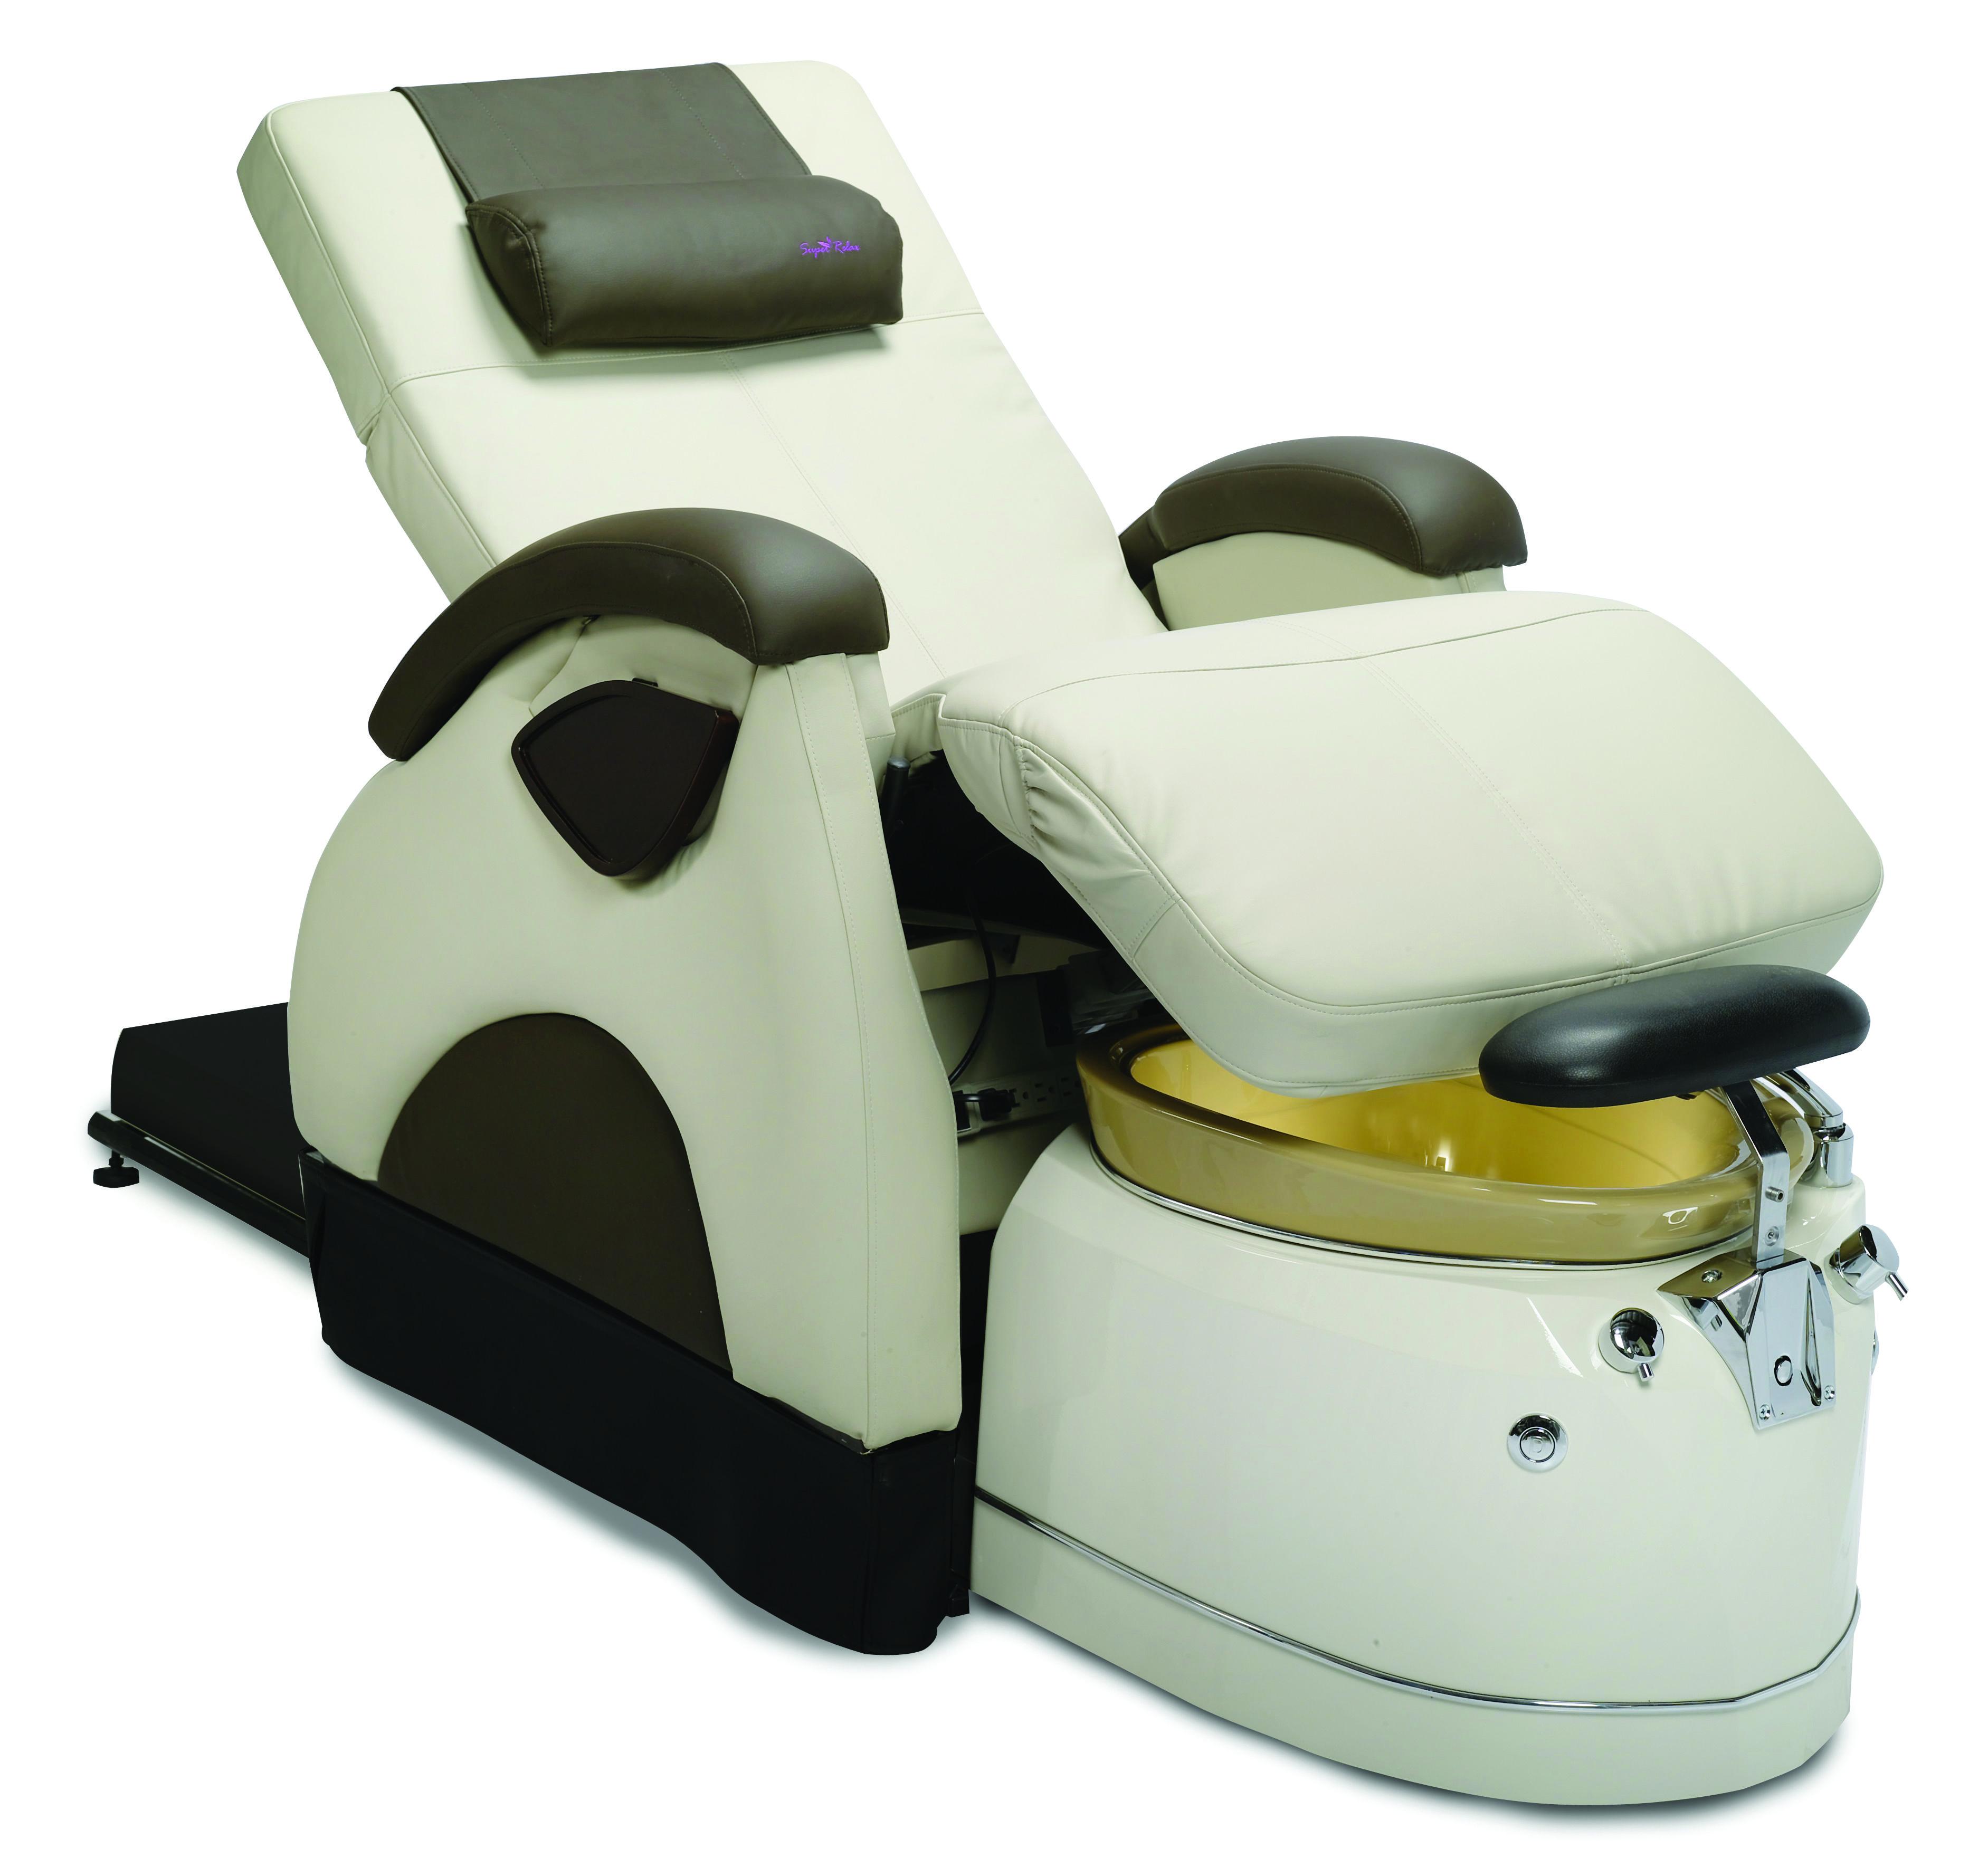 pedicure salon trendings and s spa attachment chairs superb of designs ideas chair design unique